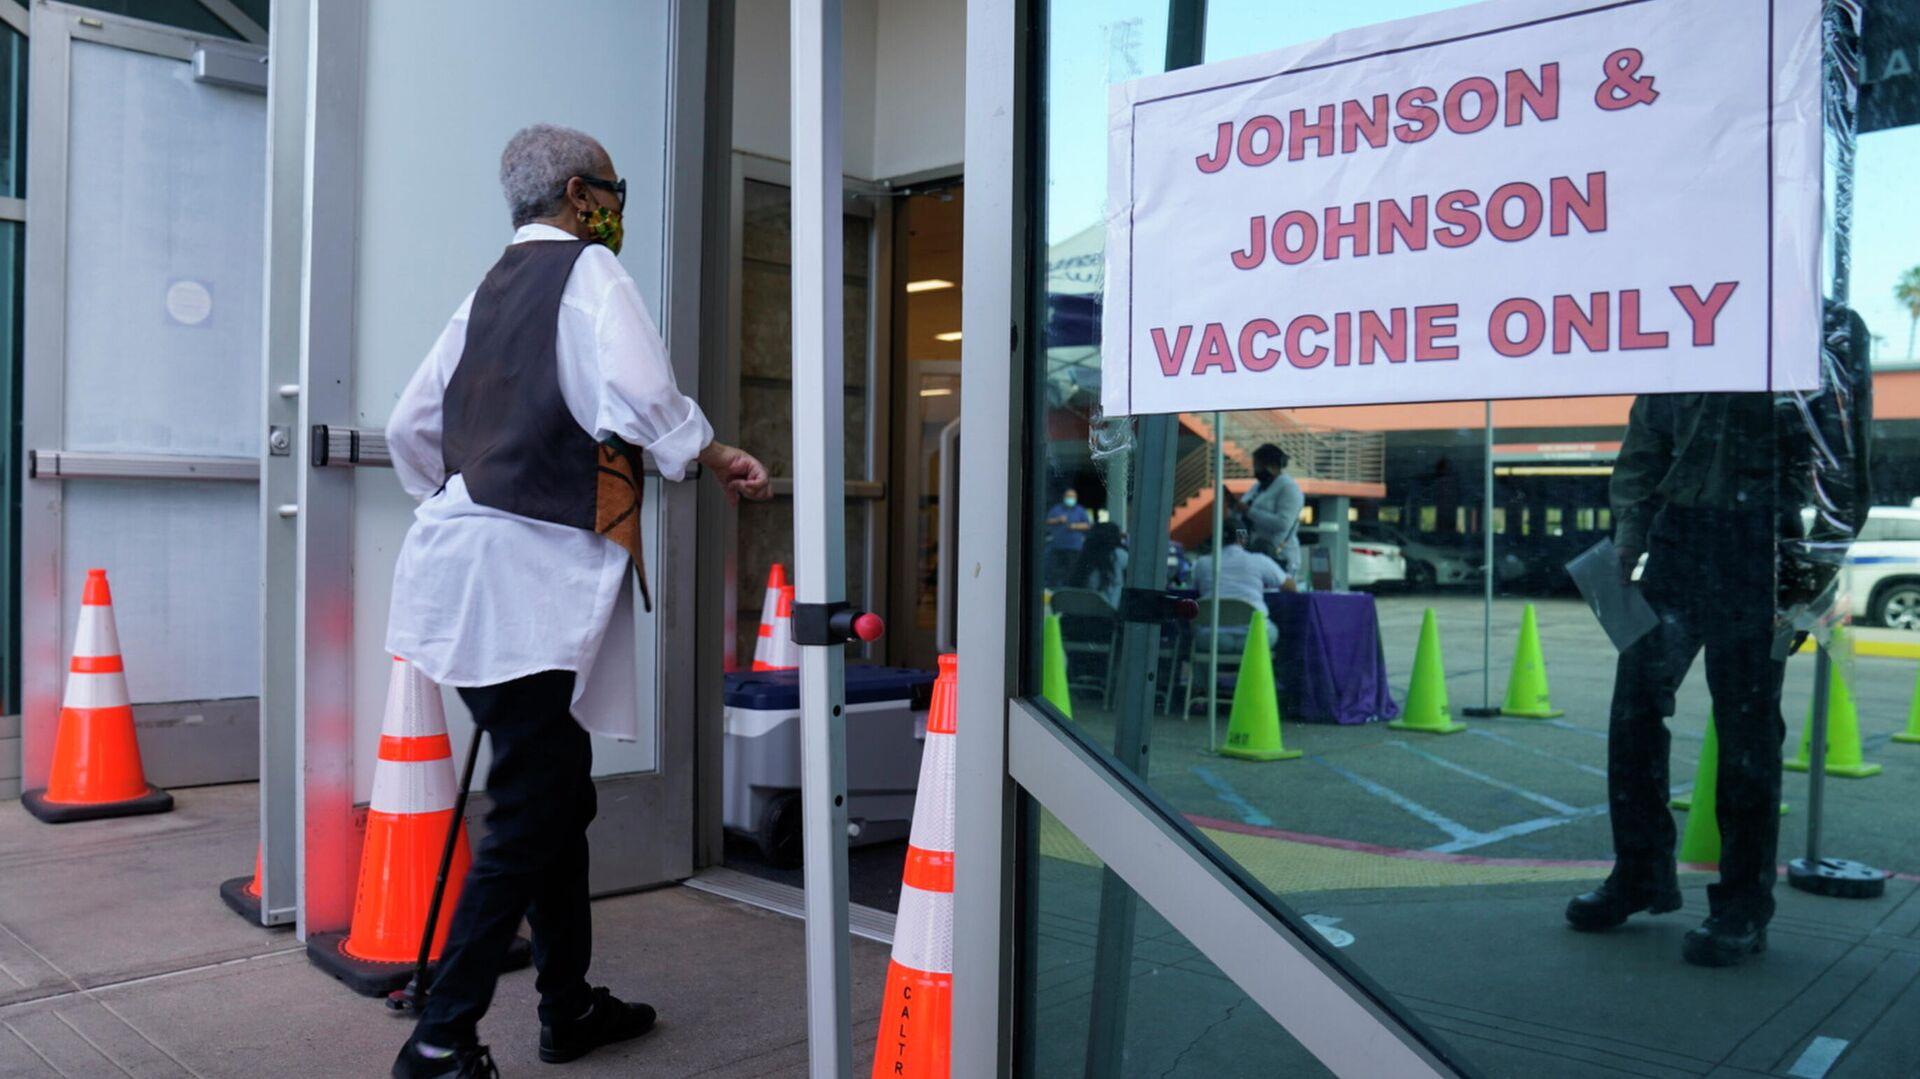 Центр вакцинации в Лос-Анджелесе, США - РИА Новости, 1920, 26.04.2021